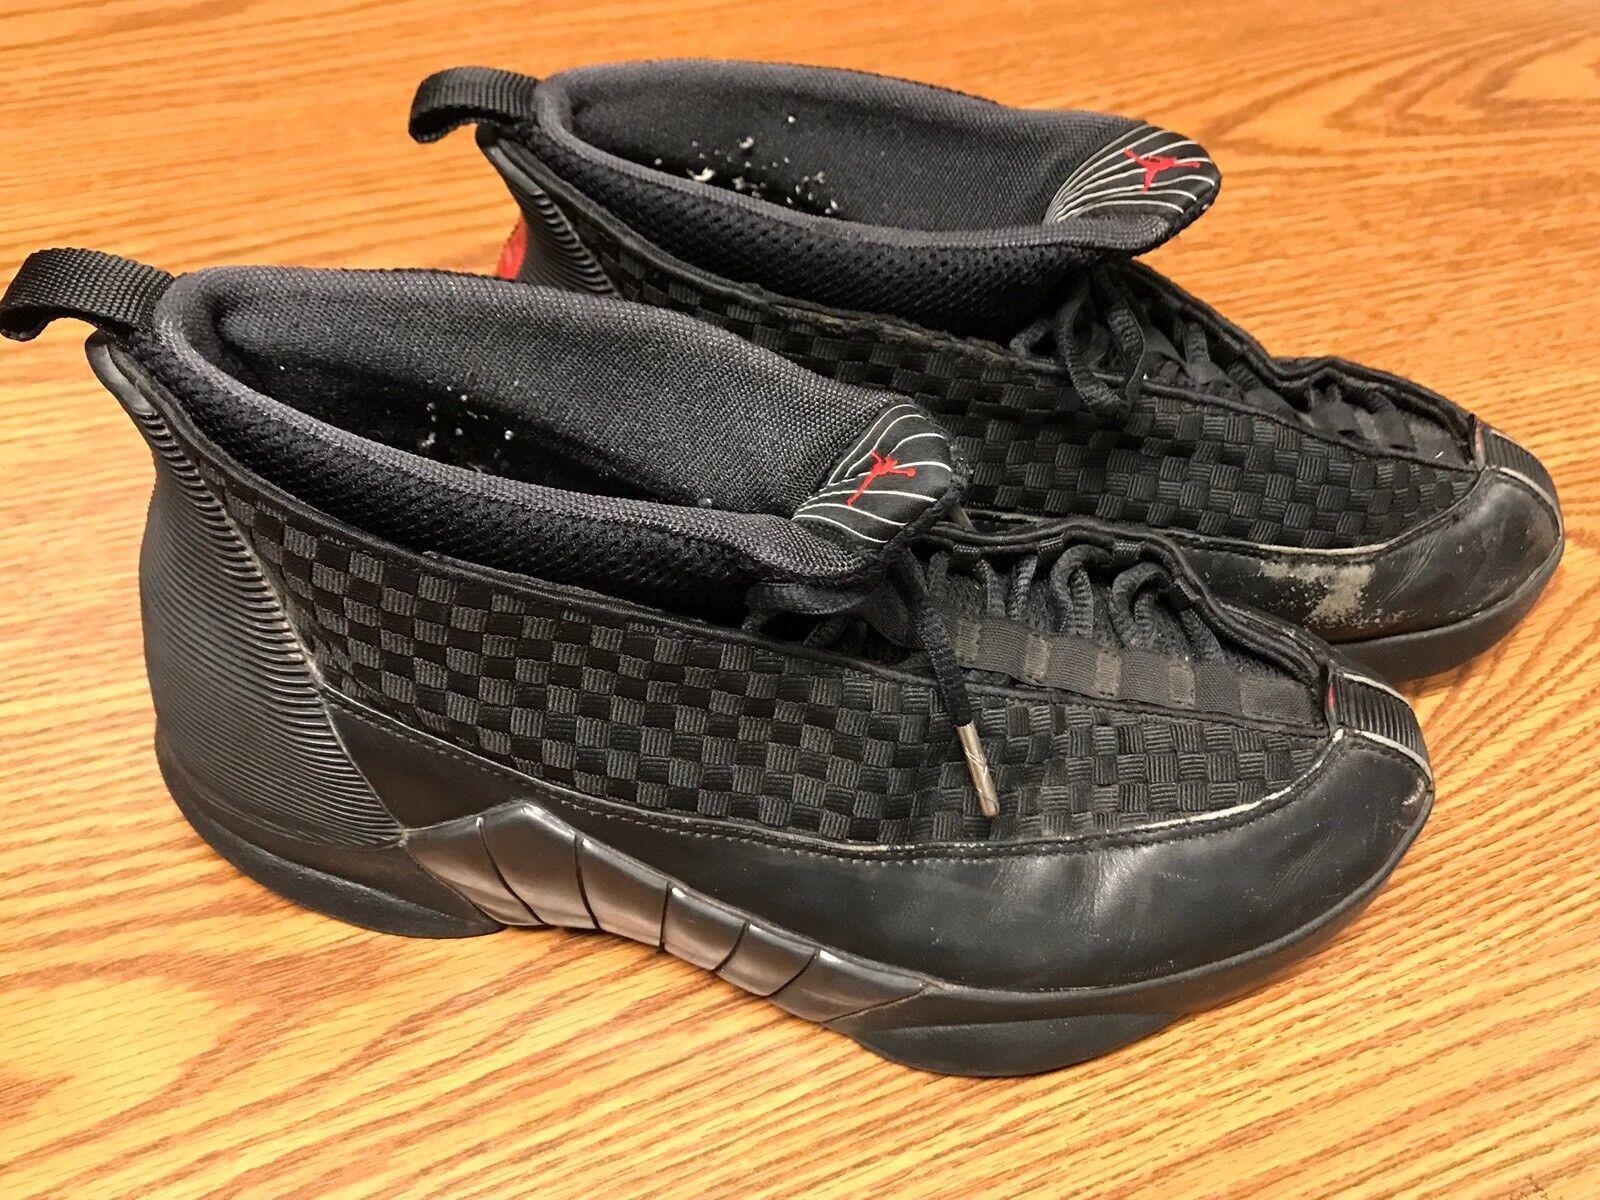 Nike 136029-061 Air Jordan XV 15 Men's Black Stealth Varsity Red Shoes Sz 10.5 Cheap women's shoes women's shoes